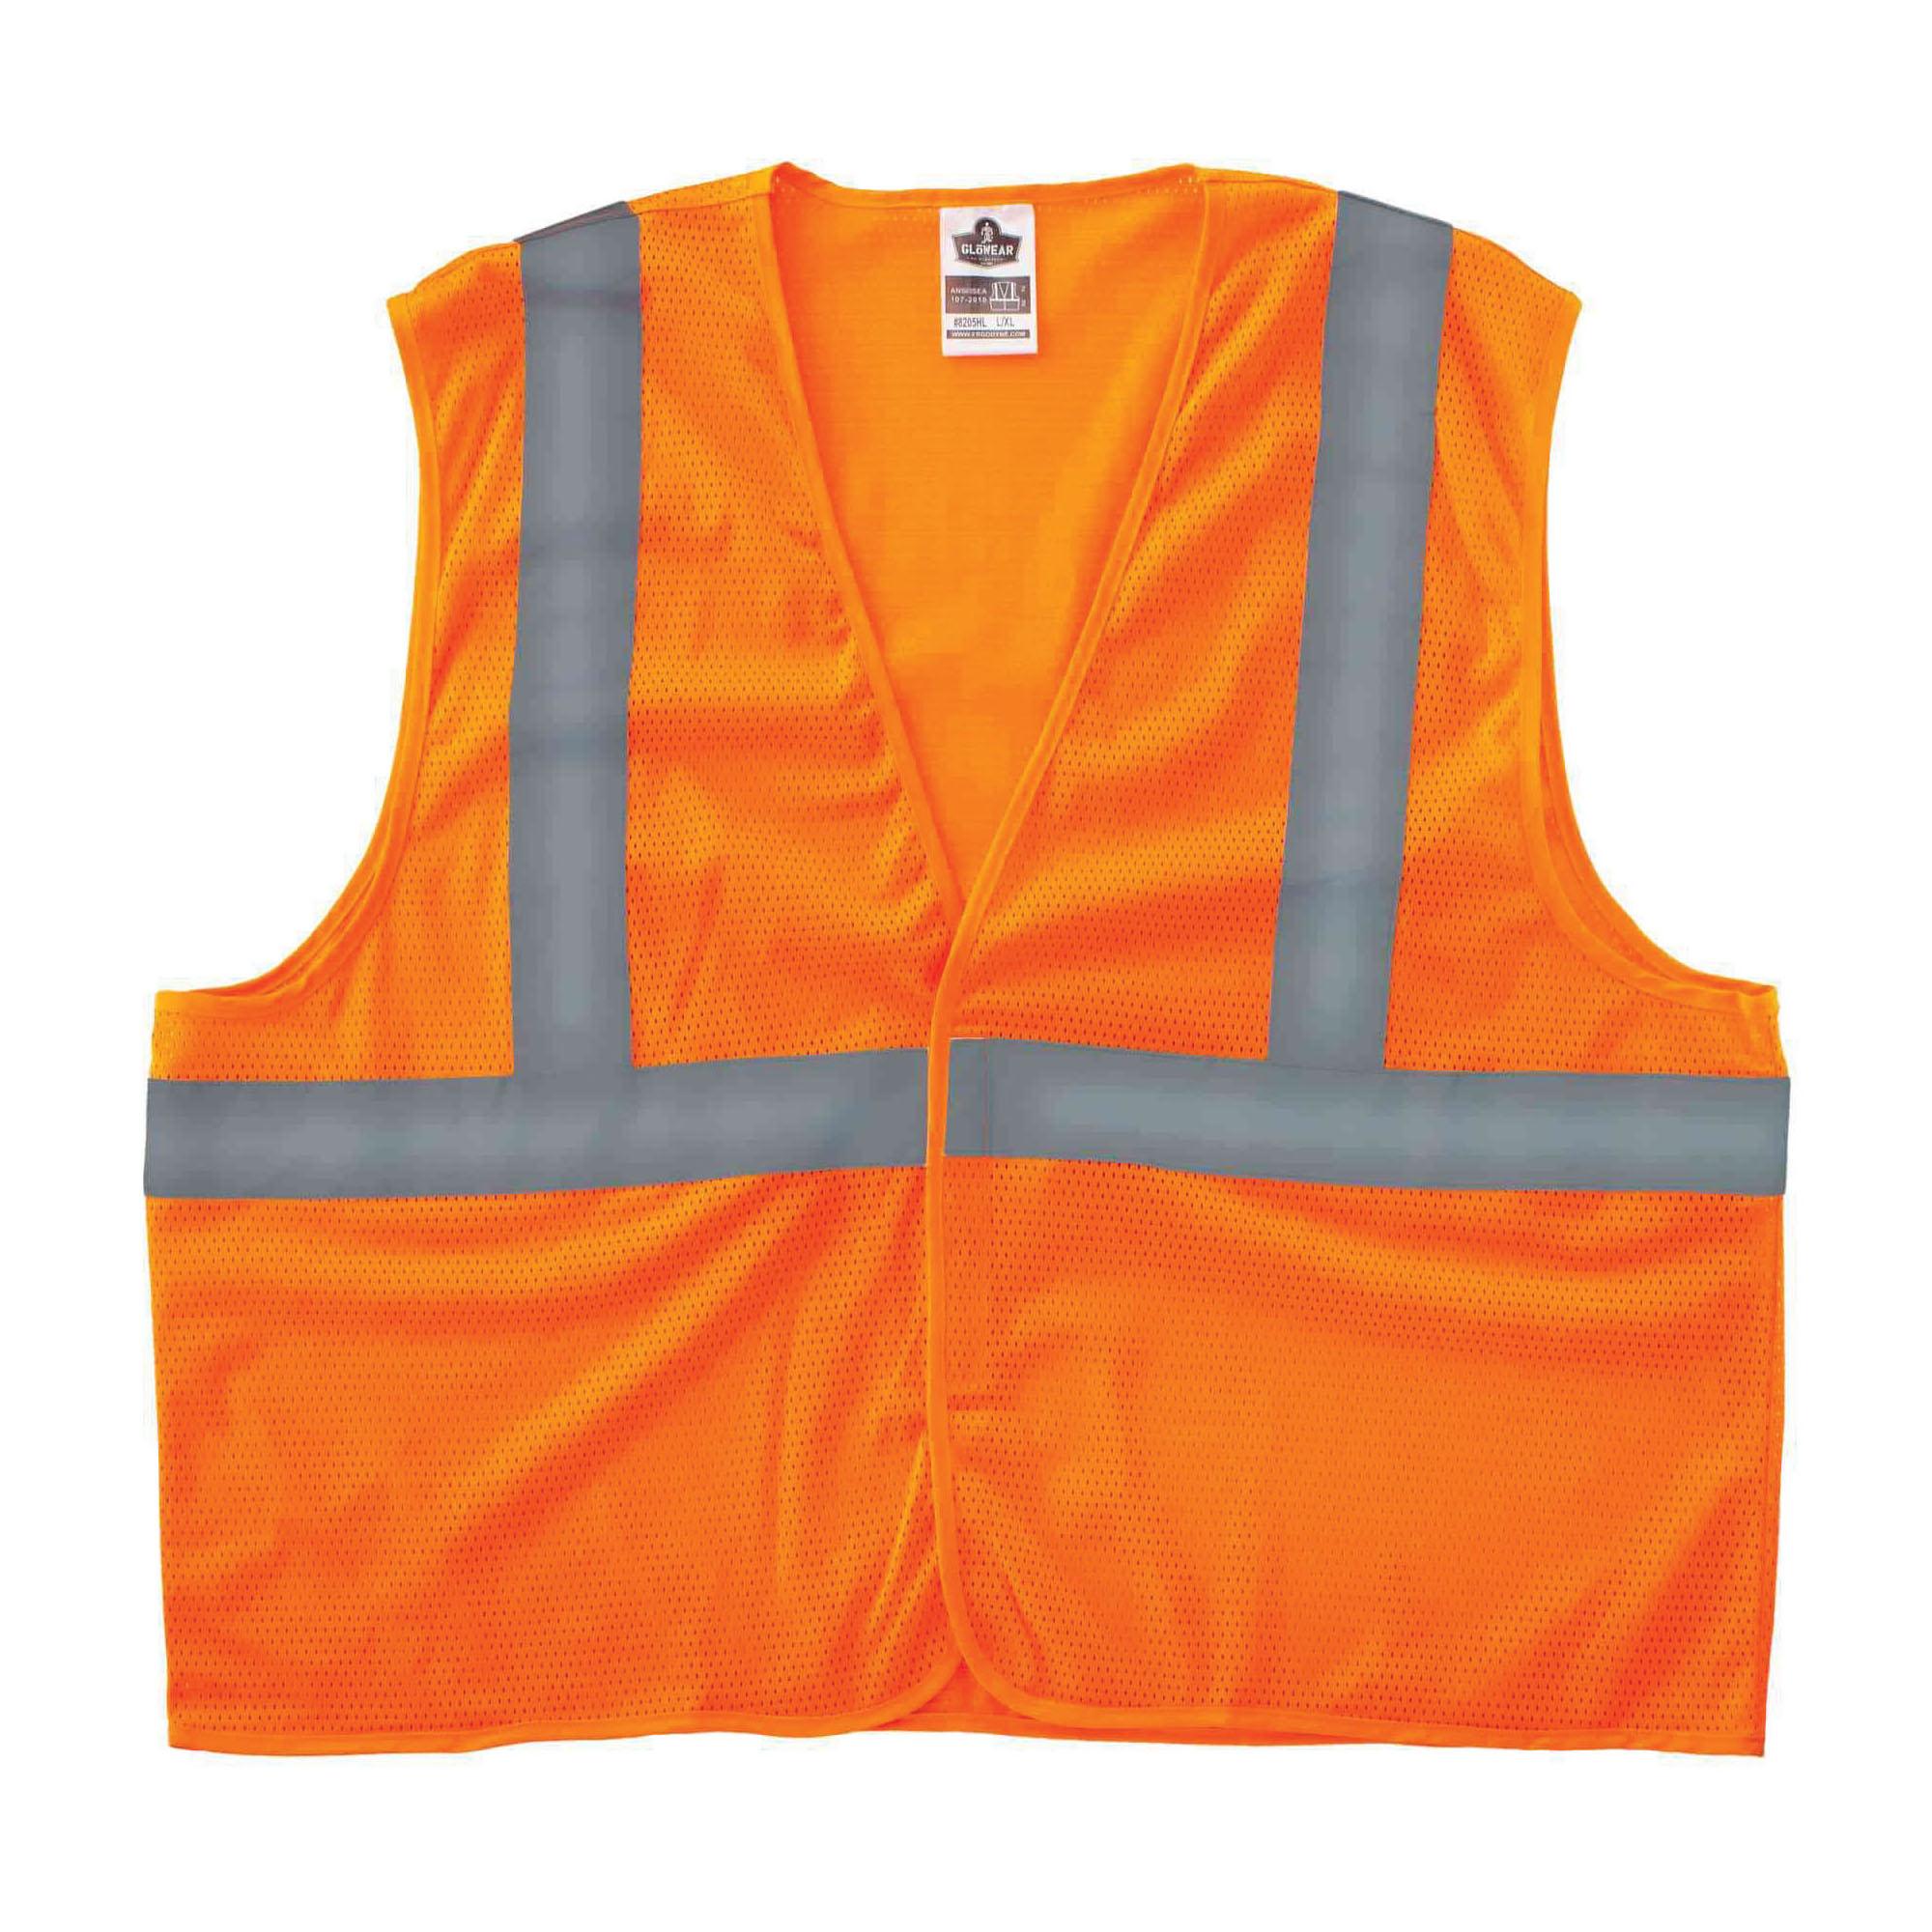 GloWear® 20969 8205HL Super Economy Vest, 4XL/5XL, Orange, Polyester Mesh, Hook and Loop Closure, ANSI Class: Class 2, ANSI/ISEA 107-2015 Type R